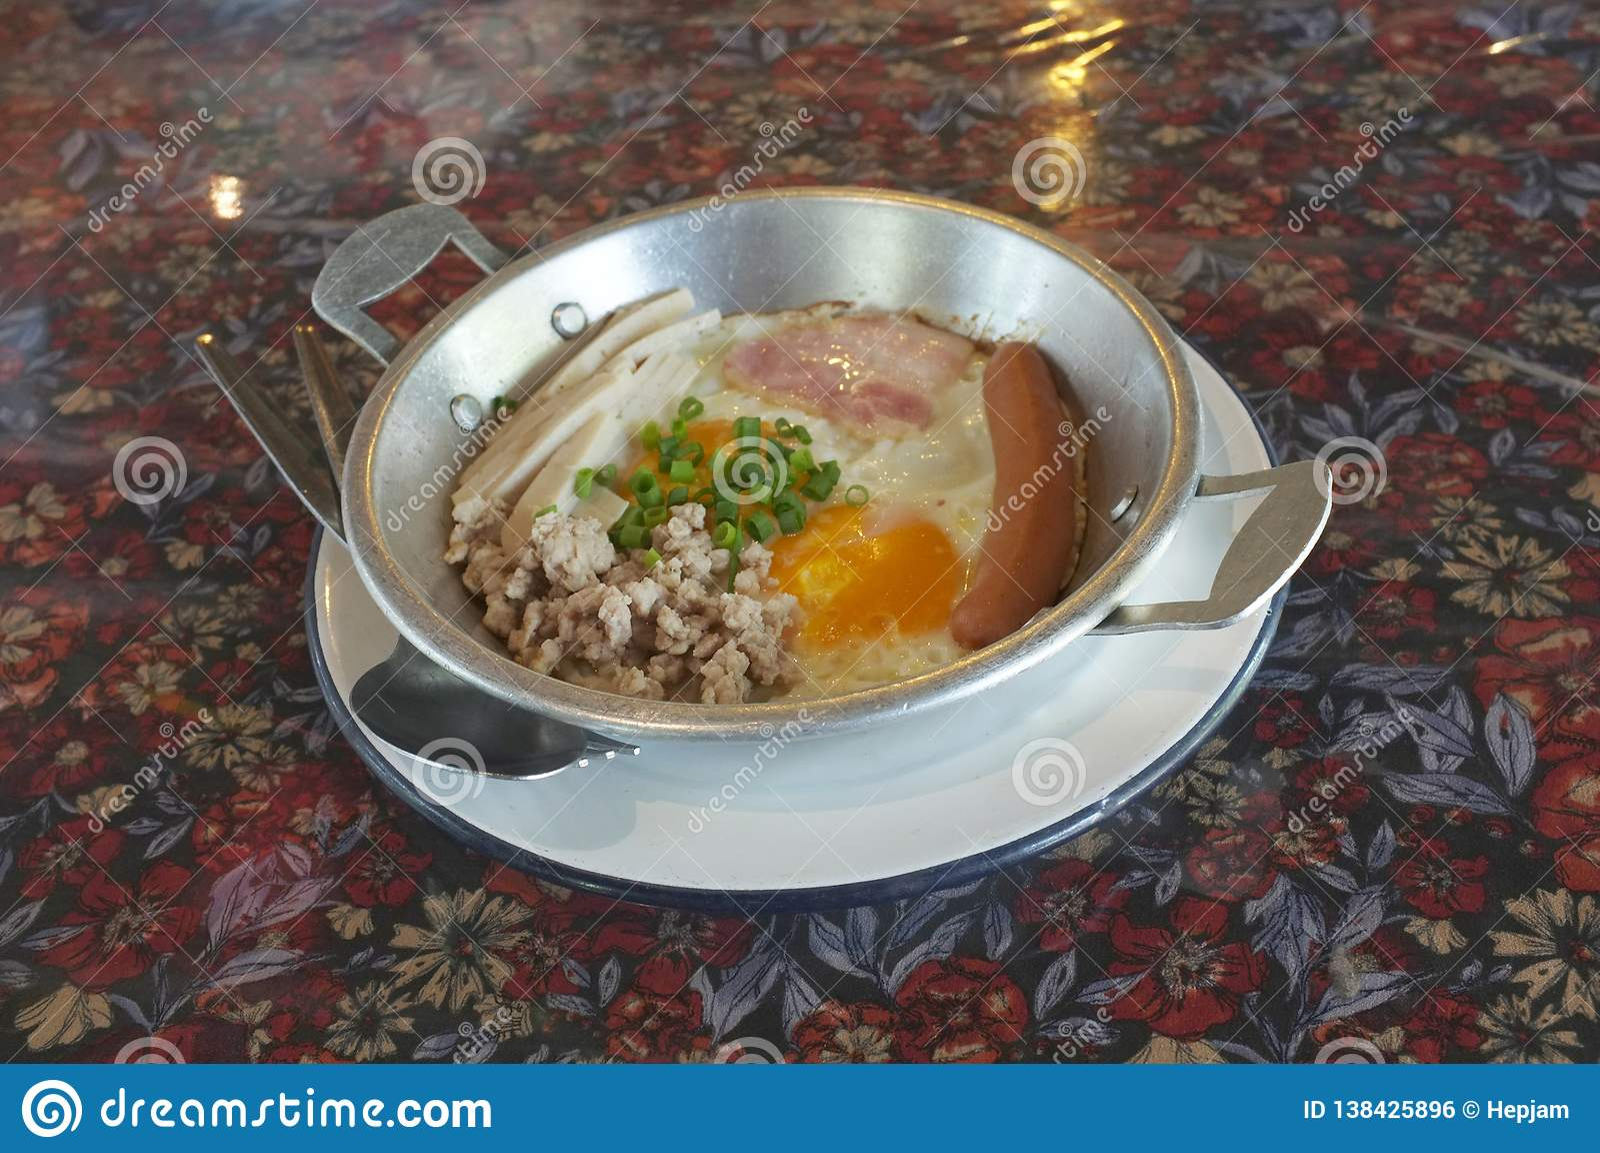 Indochina pan-gebraden ei met bovenste laagjes